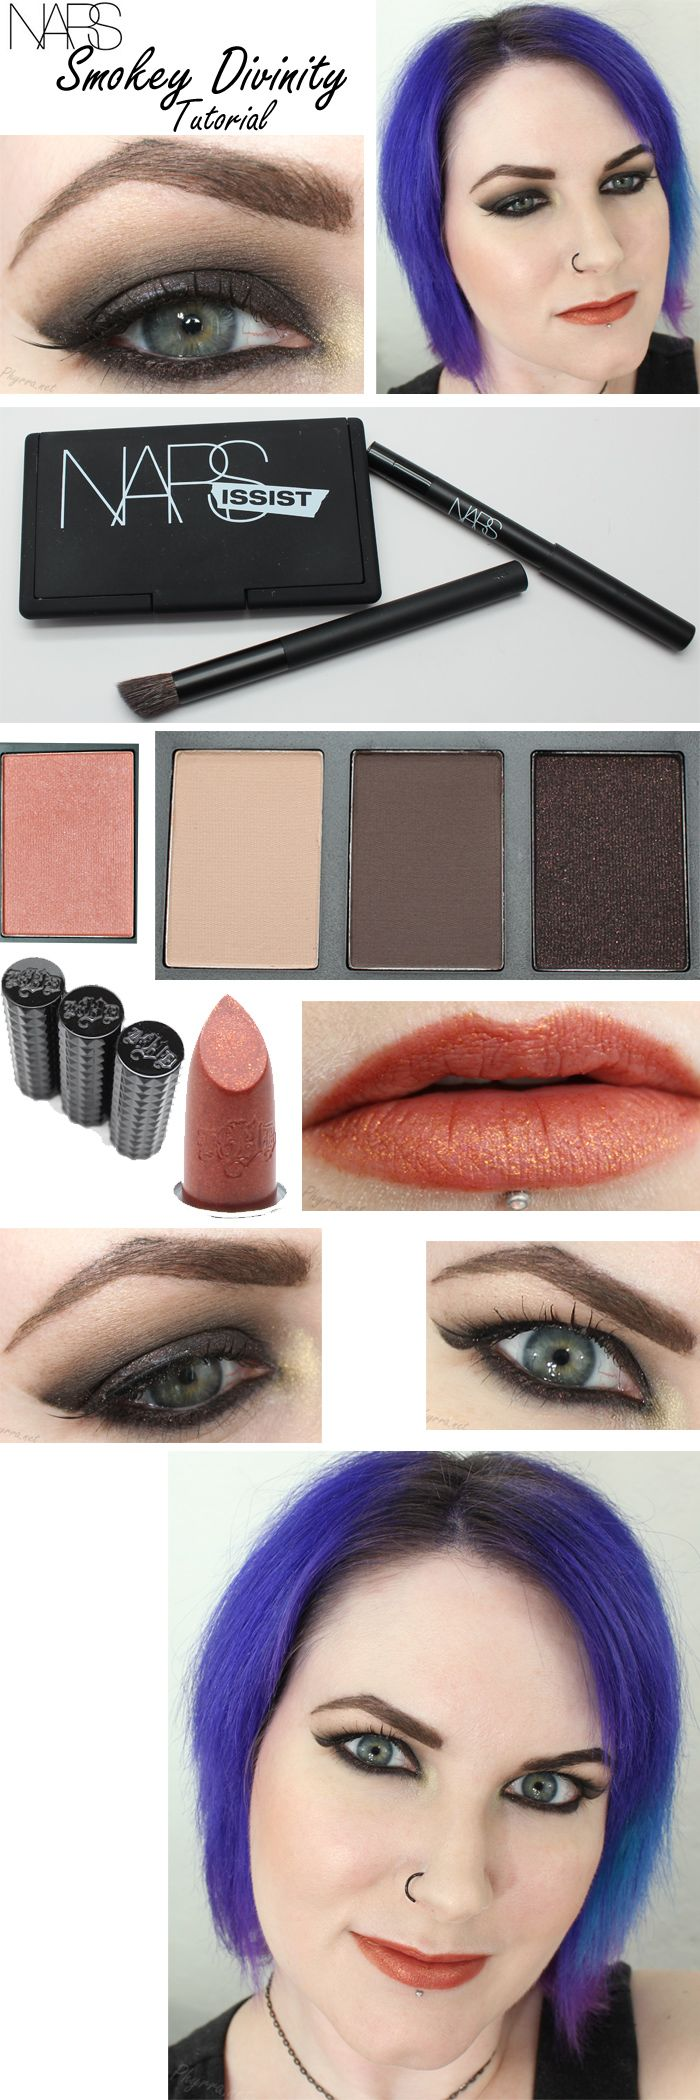 1000+ Images About Kat Von D Make-up On Pinterest